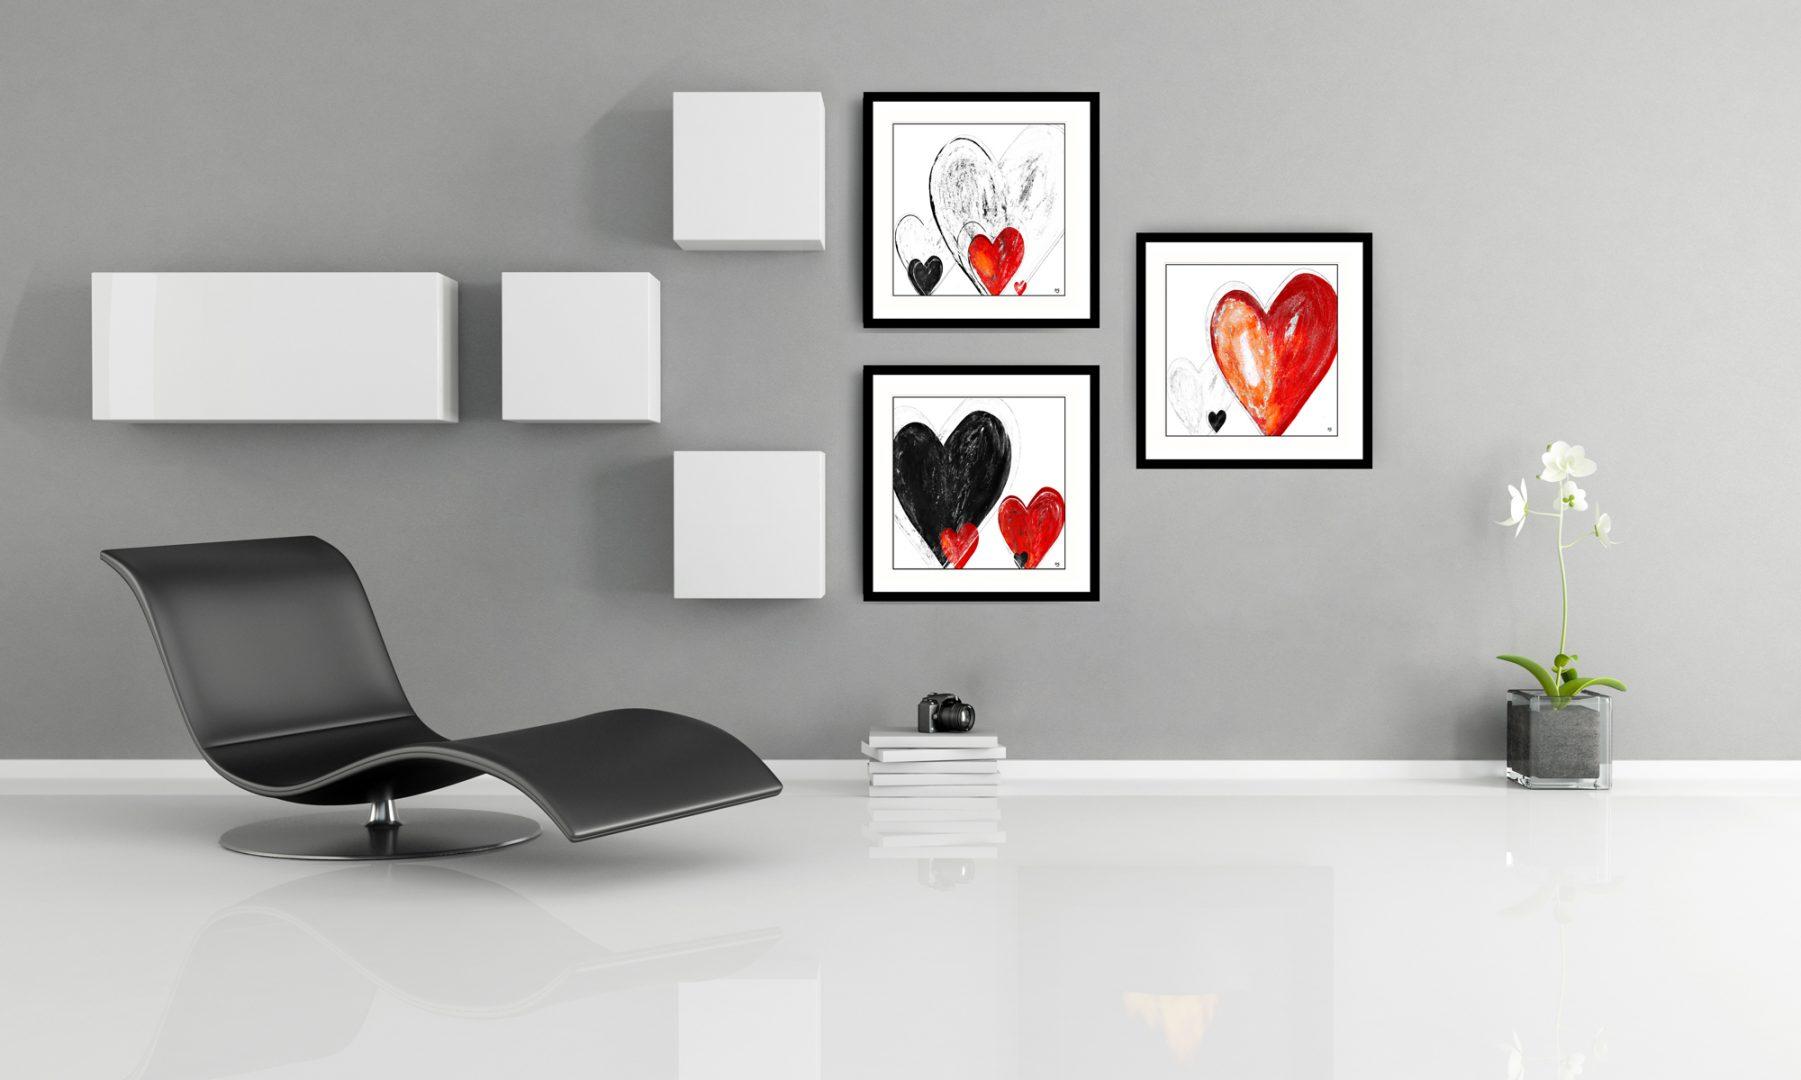 Heart artwork by Stef Kerswell